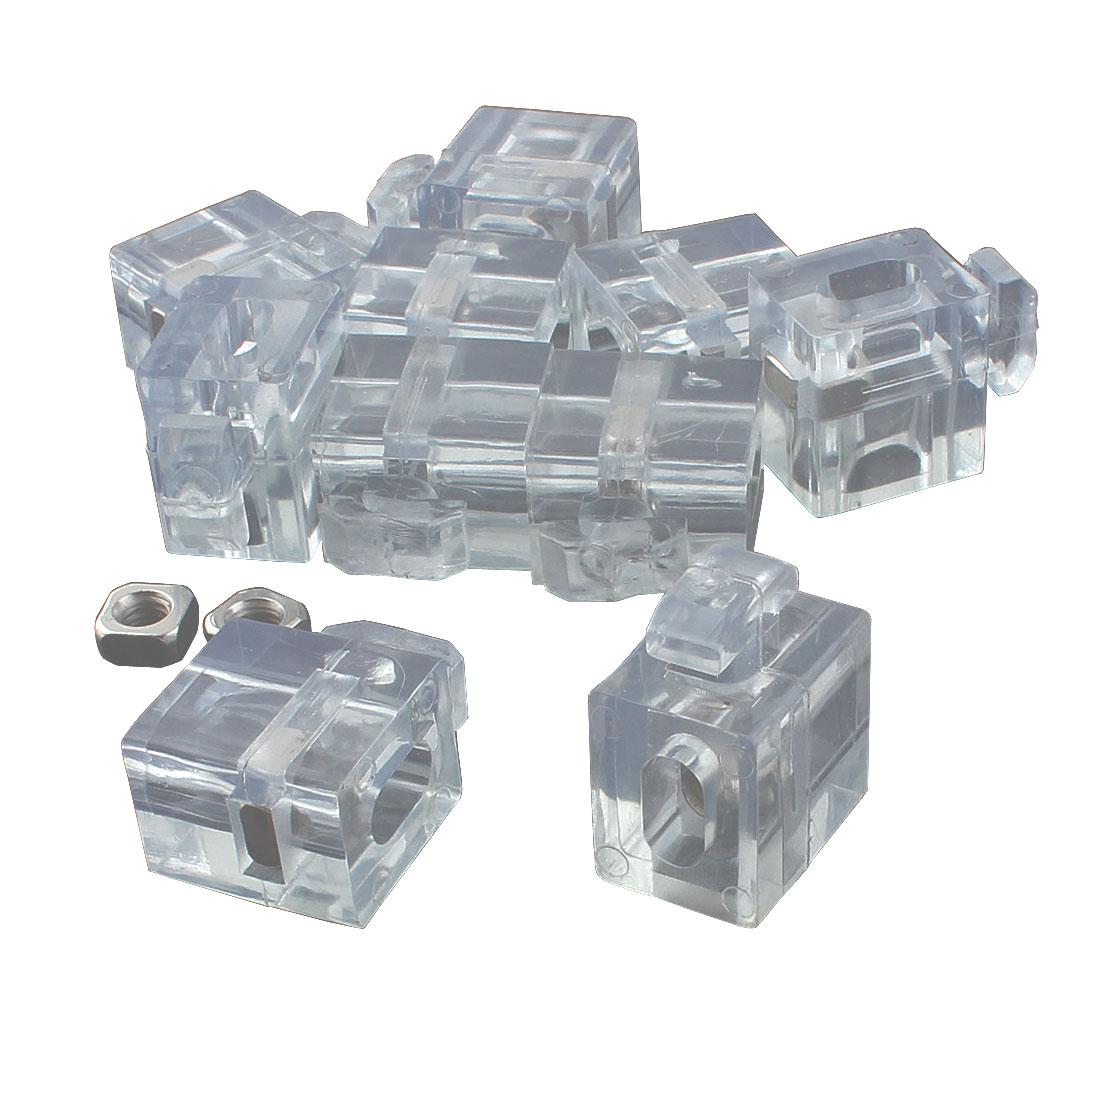 Square Nut Aluminum Profile 40 Series Spacer Fastener Connector Block Clear 10pcs